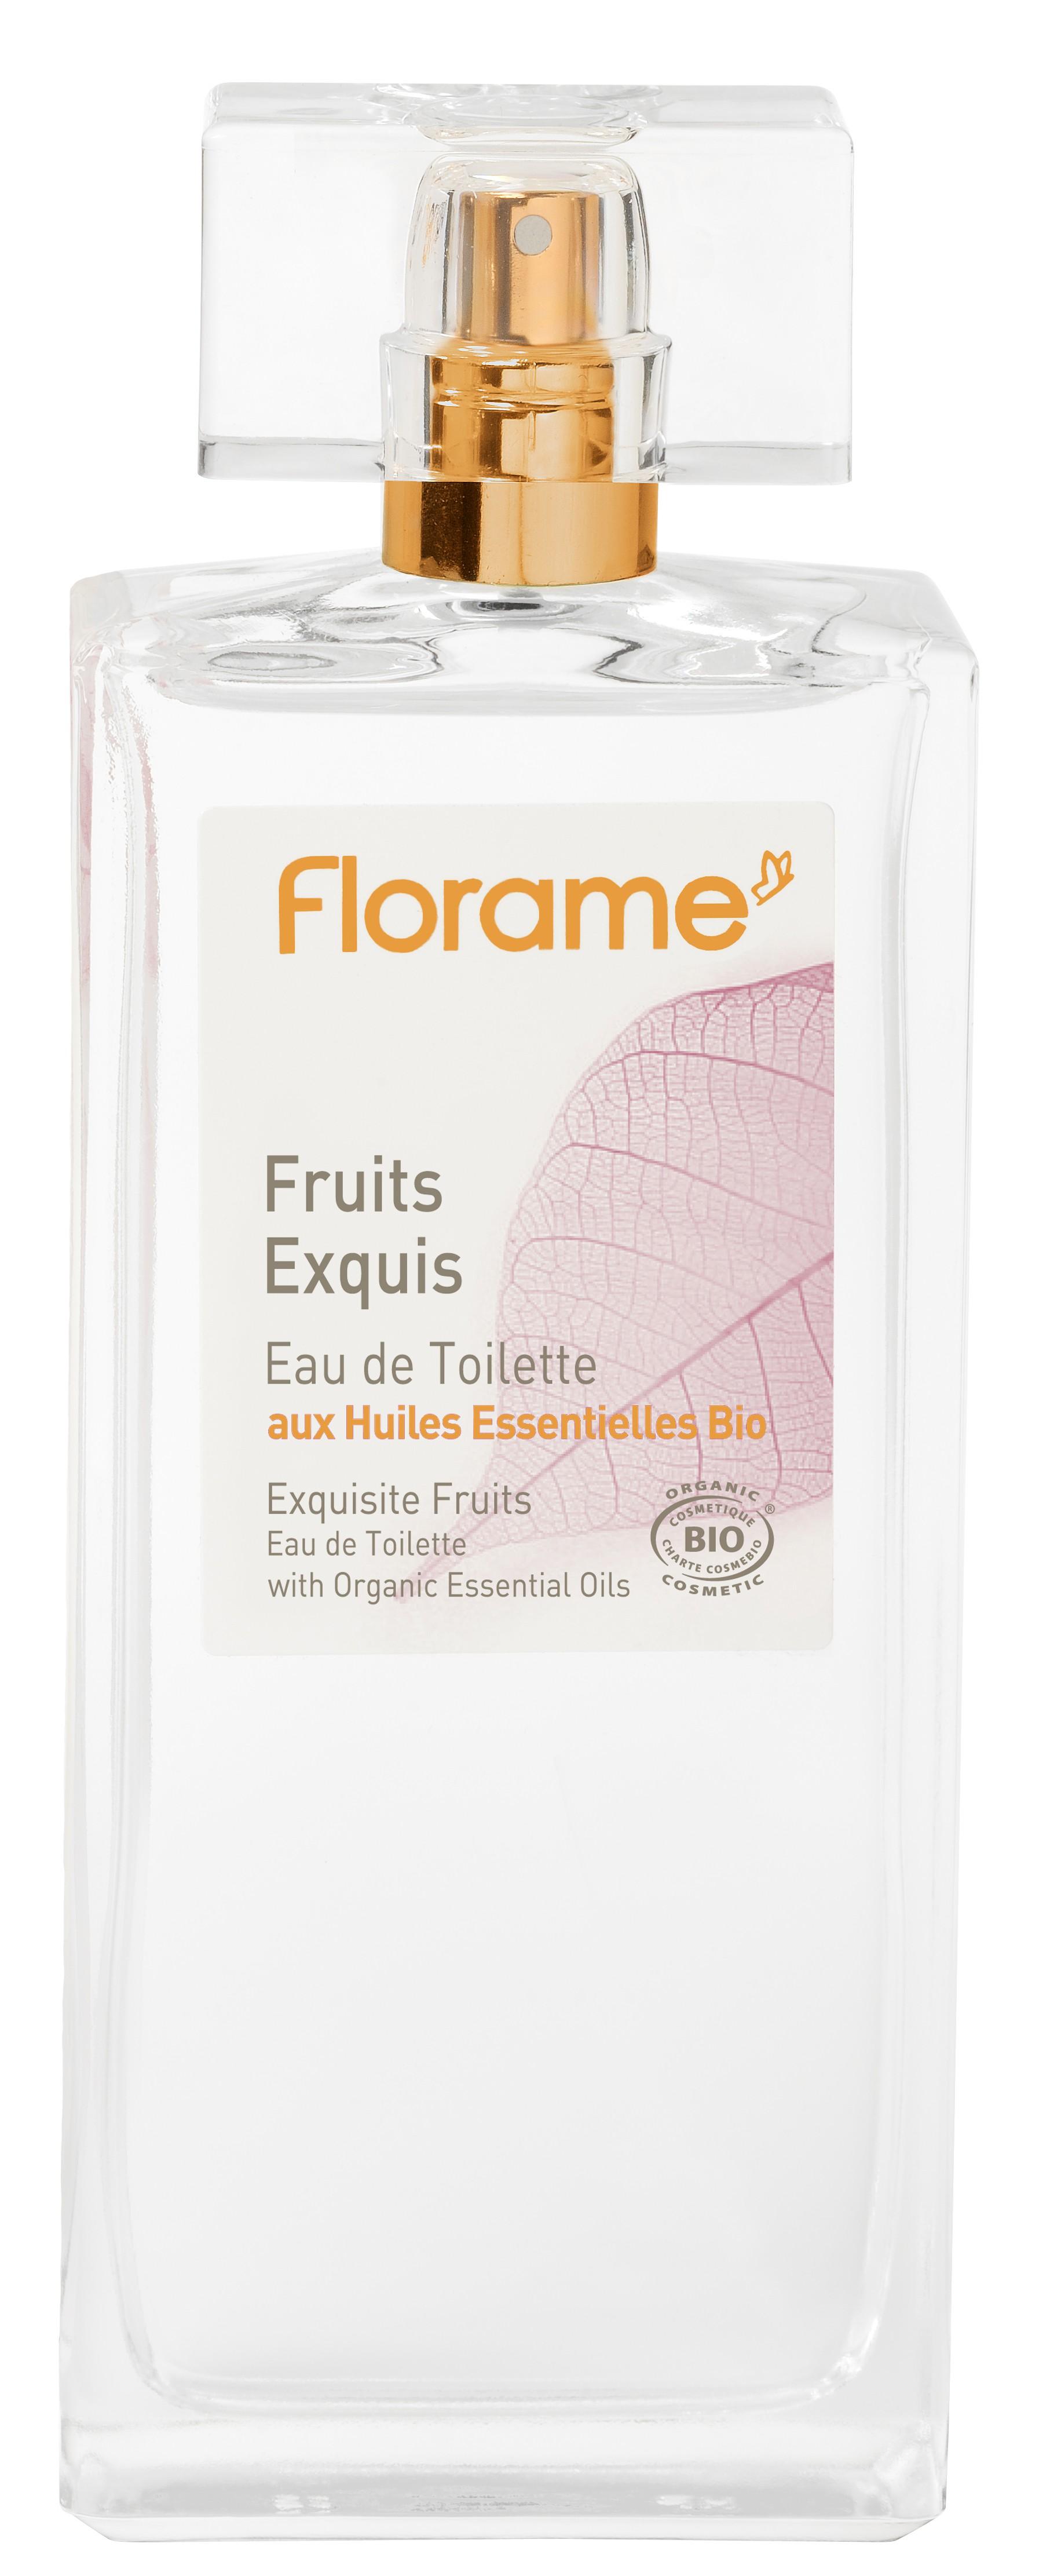 Florame Fruits Exquis аромат для женщин